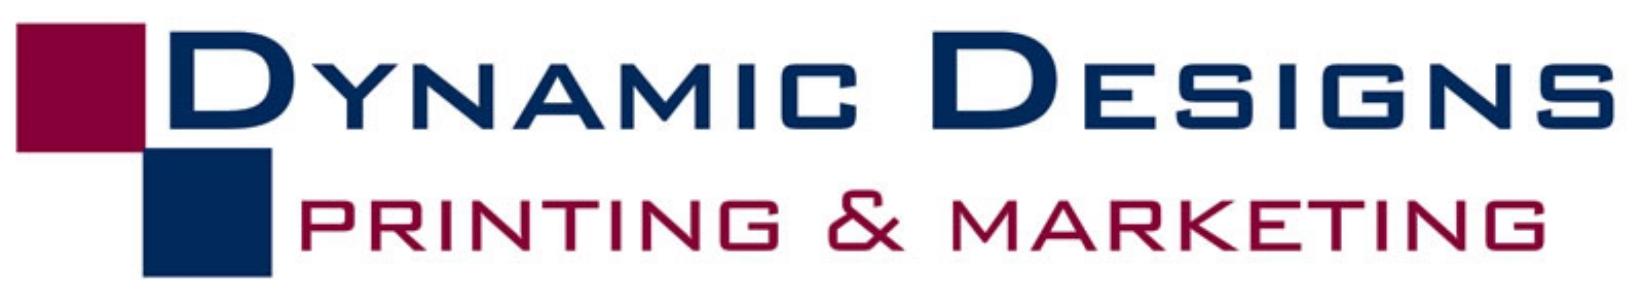 dynamic-designs-printing-marketing-logo-big.jpg